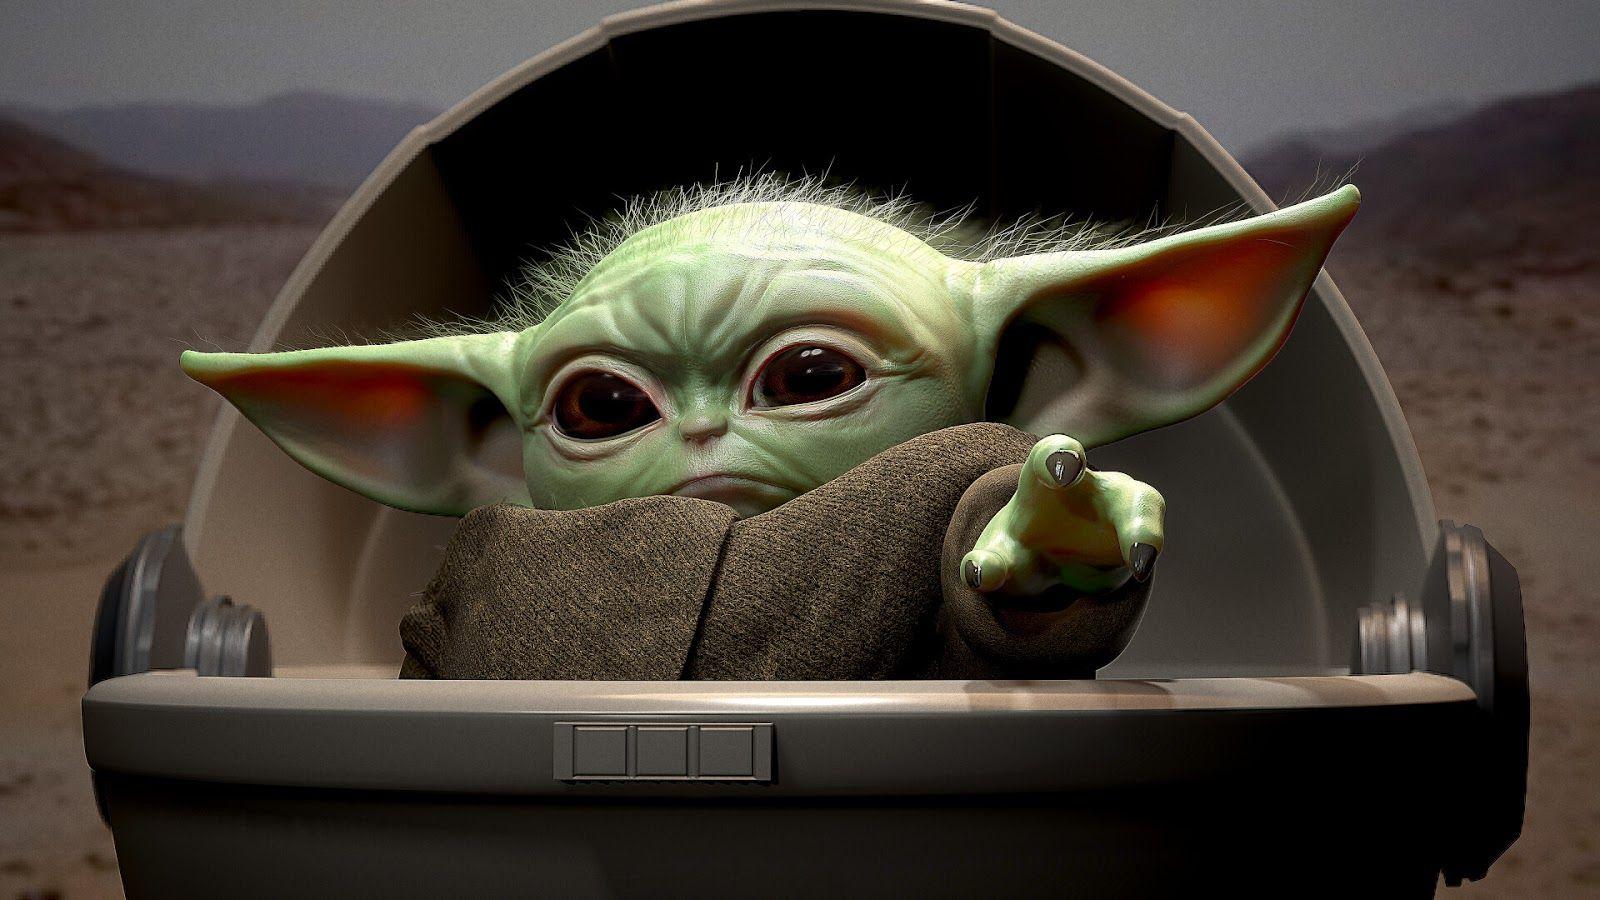 Baby Yoda Clipart For Free Yoda Wallpaper Star Wars Wallpaper Cool Wallpaper